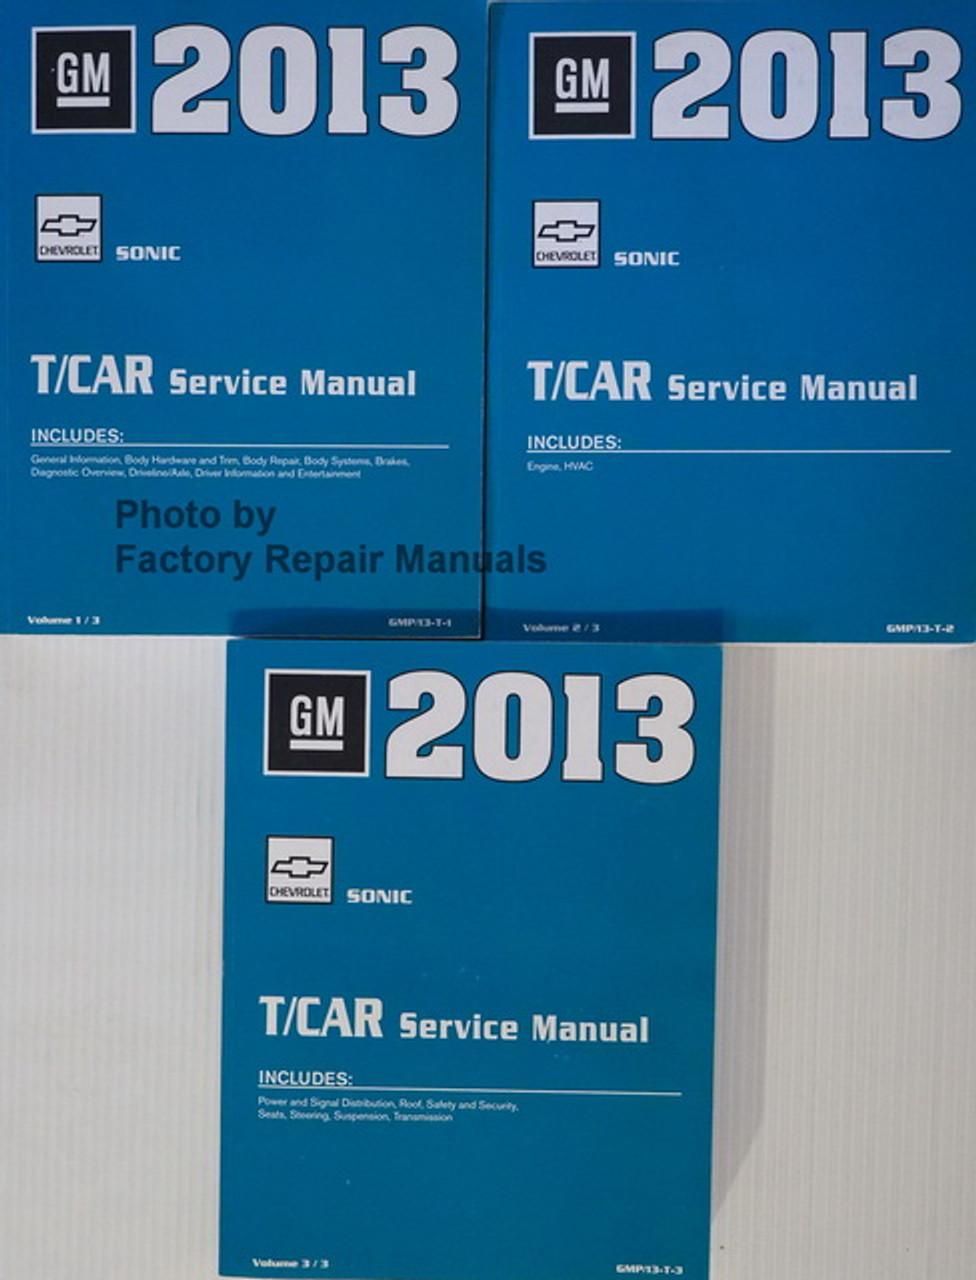 2013 Chevy Sonic Factory Service Manual 3 Volume Set Original Shop Repair